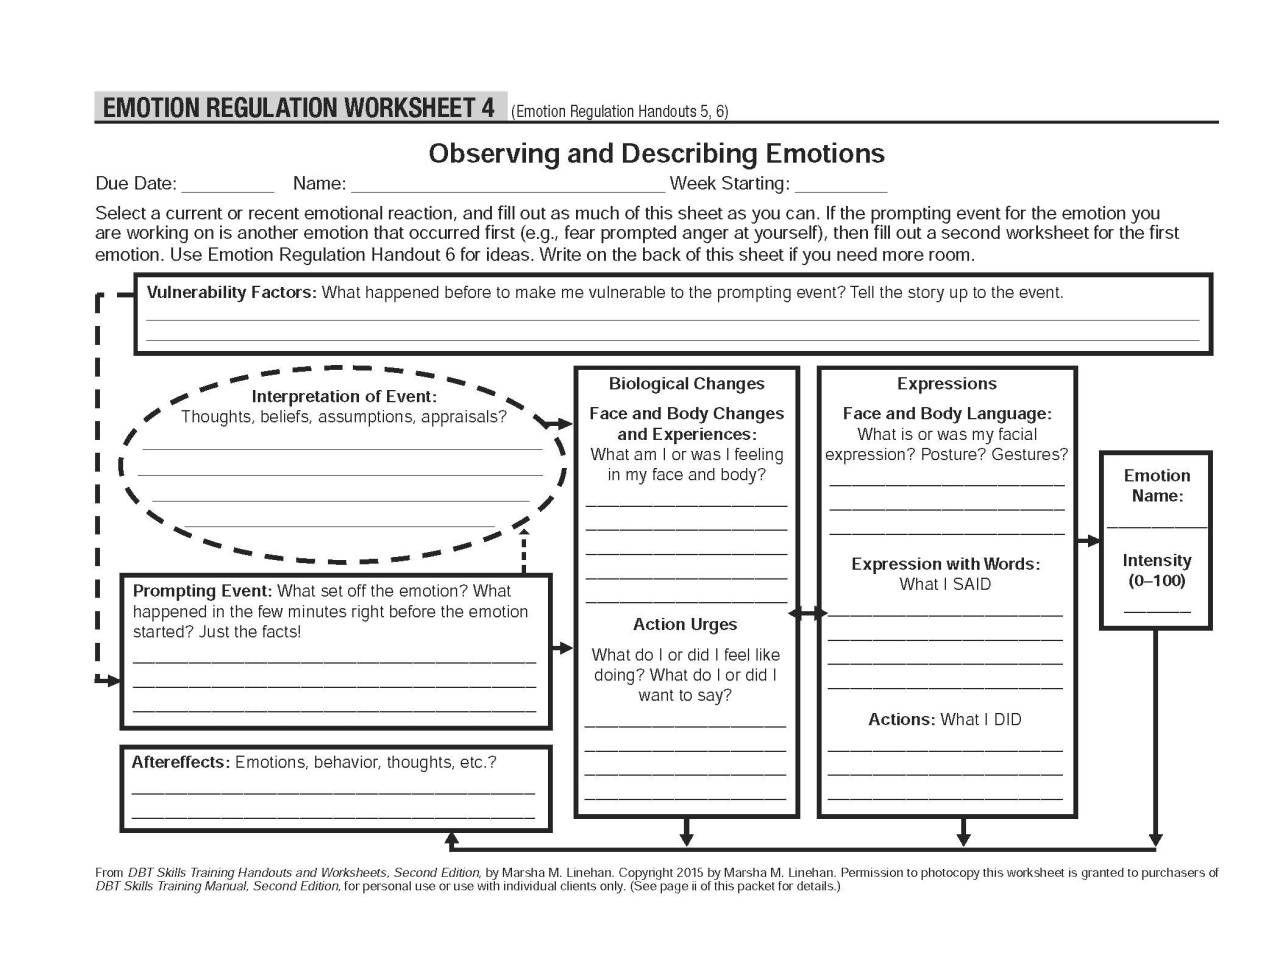 worksheet Emotion Regulation Worksheet Pdf healing schemas dbt self help resources observing and describing emotions these worksheets accompany the emotion regulation handout 6